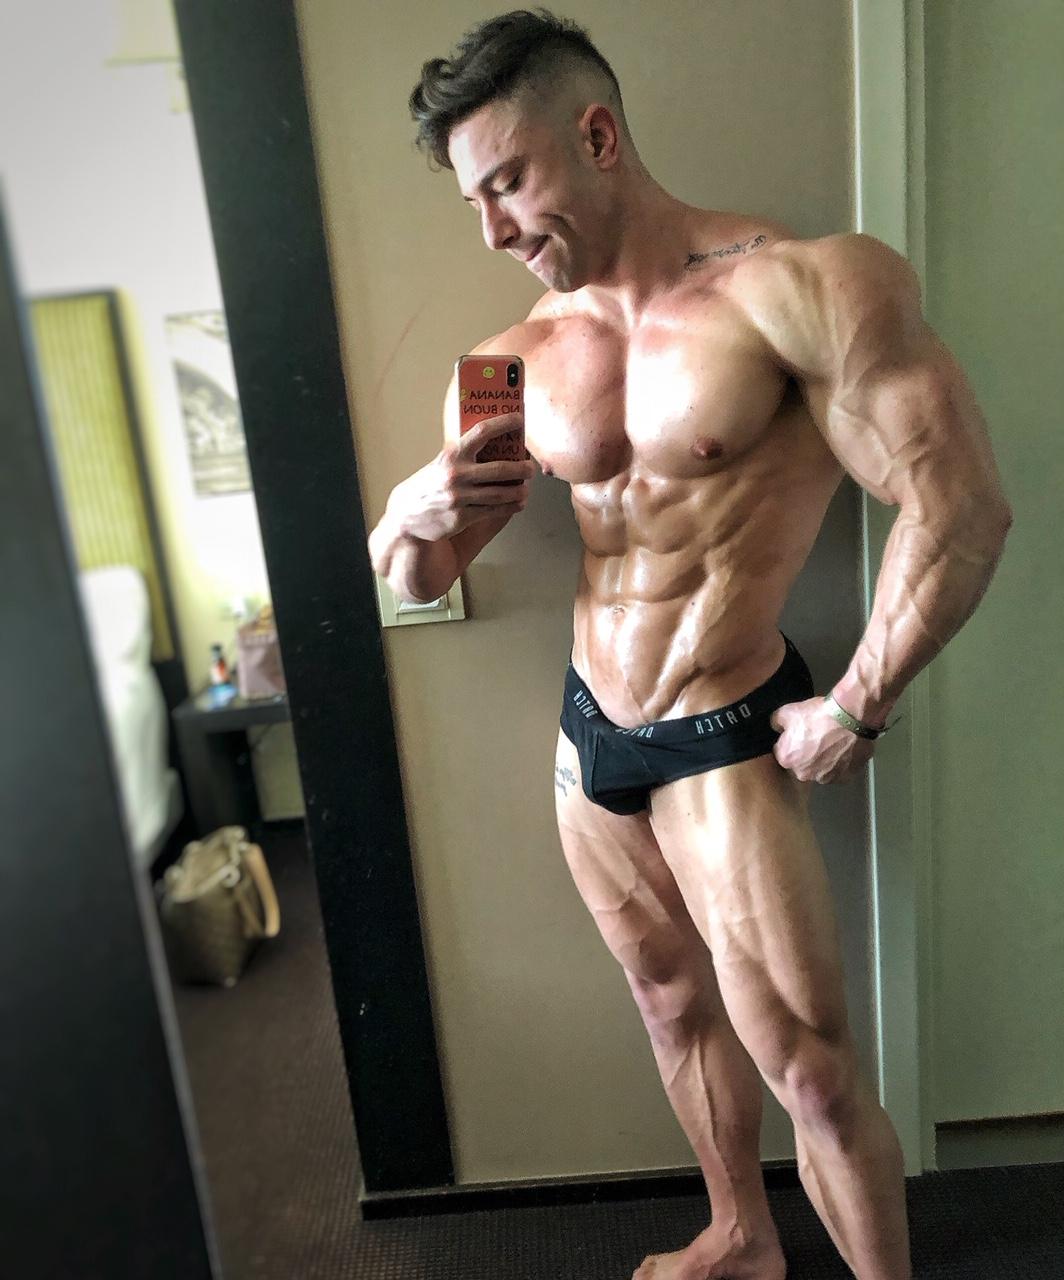 Manuel Santalucia atleta professionista